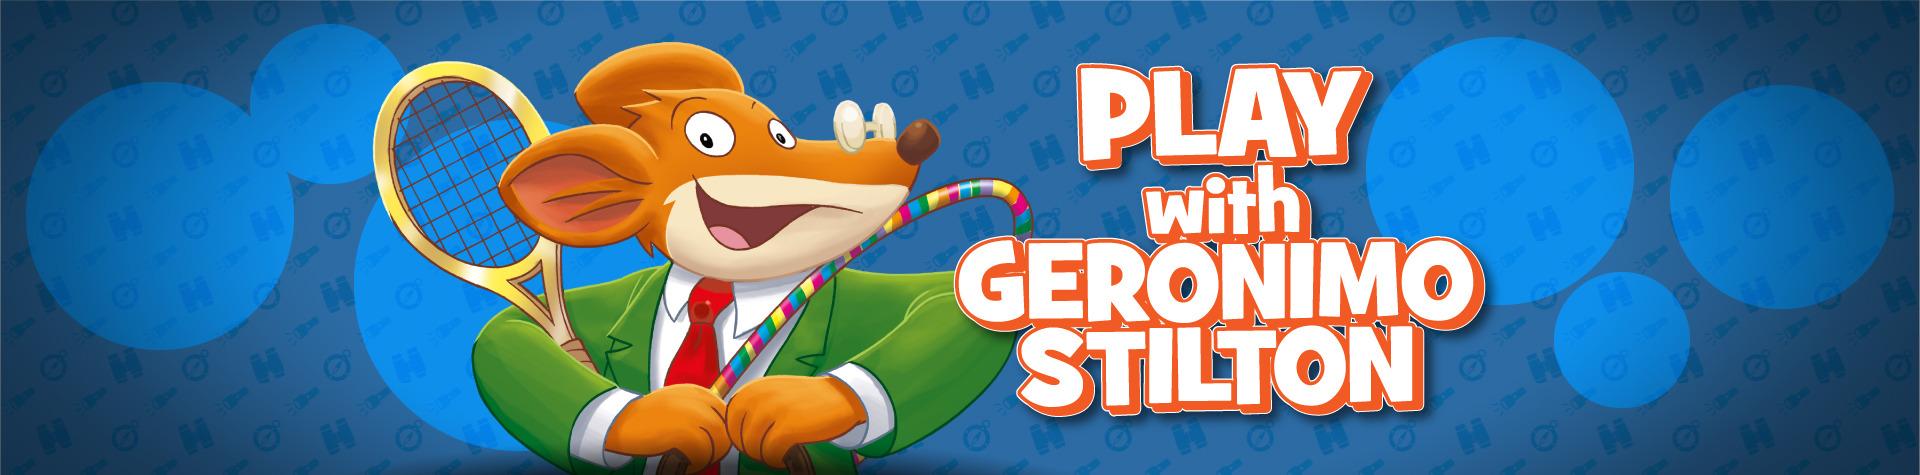 Play with Geronimo Stilton